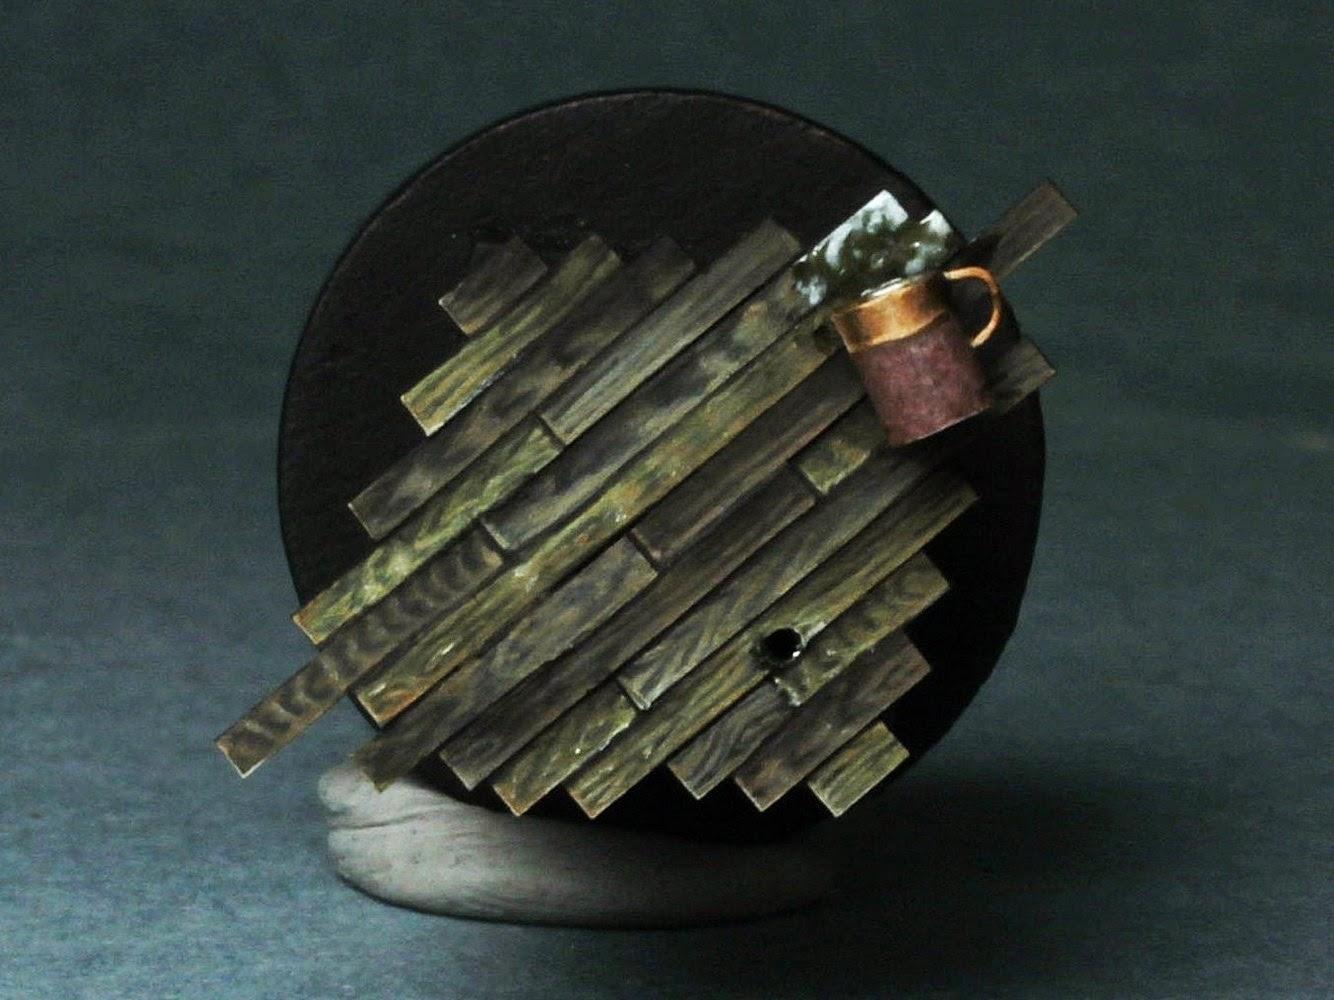 Mis Olvidadas Figuras: Rosman Studio: Paso a paso: Como simular madera so...